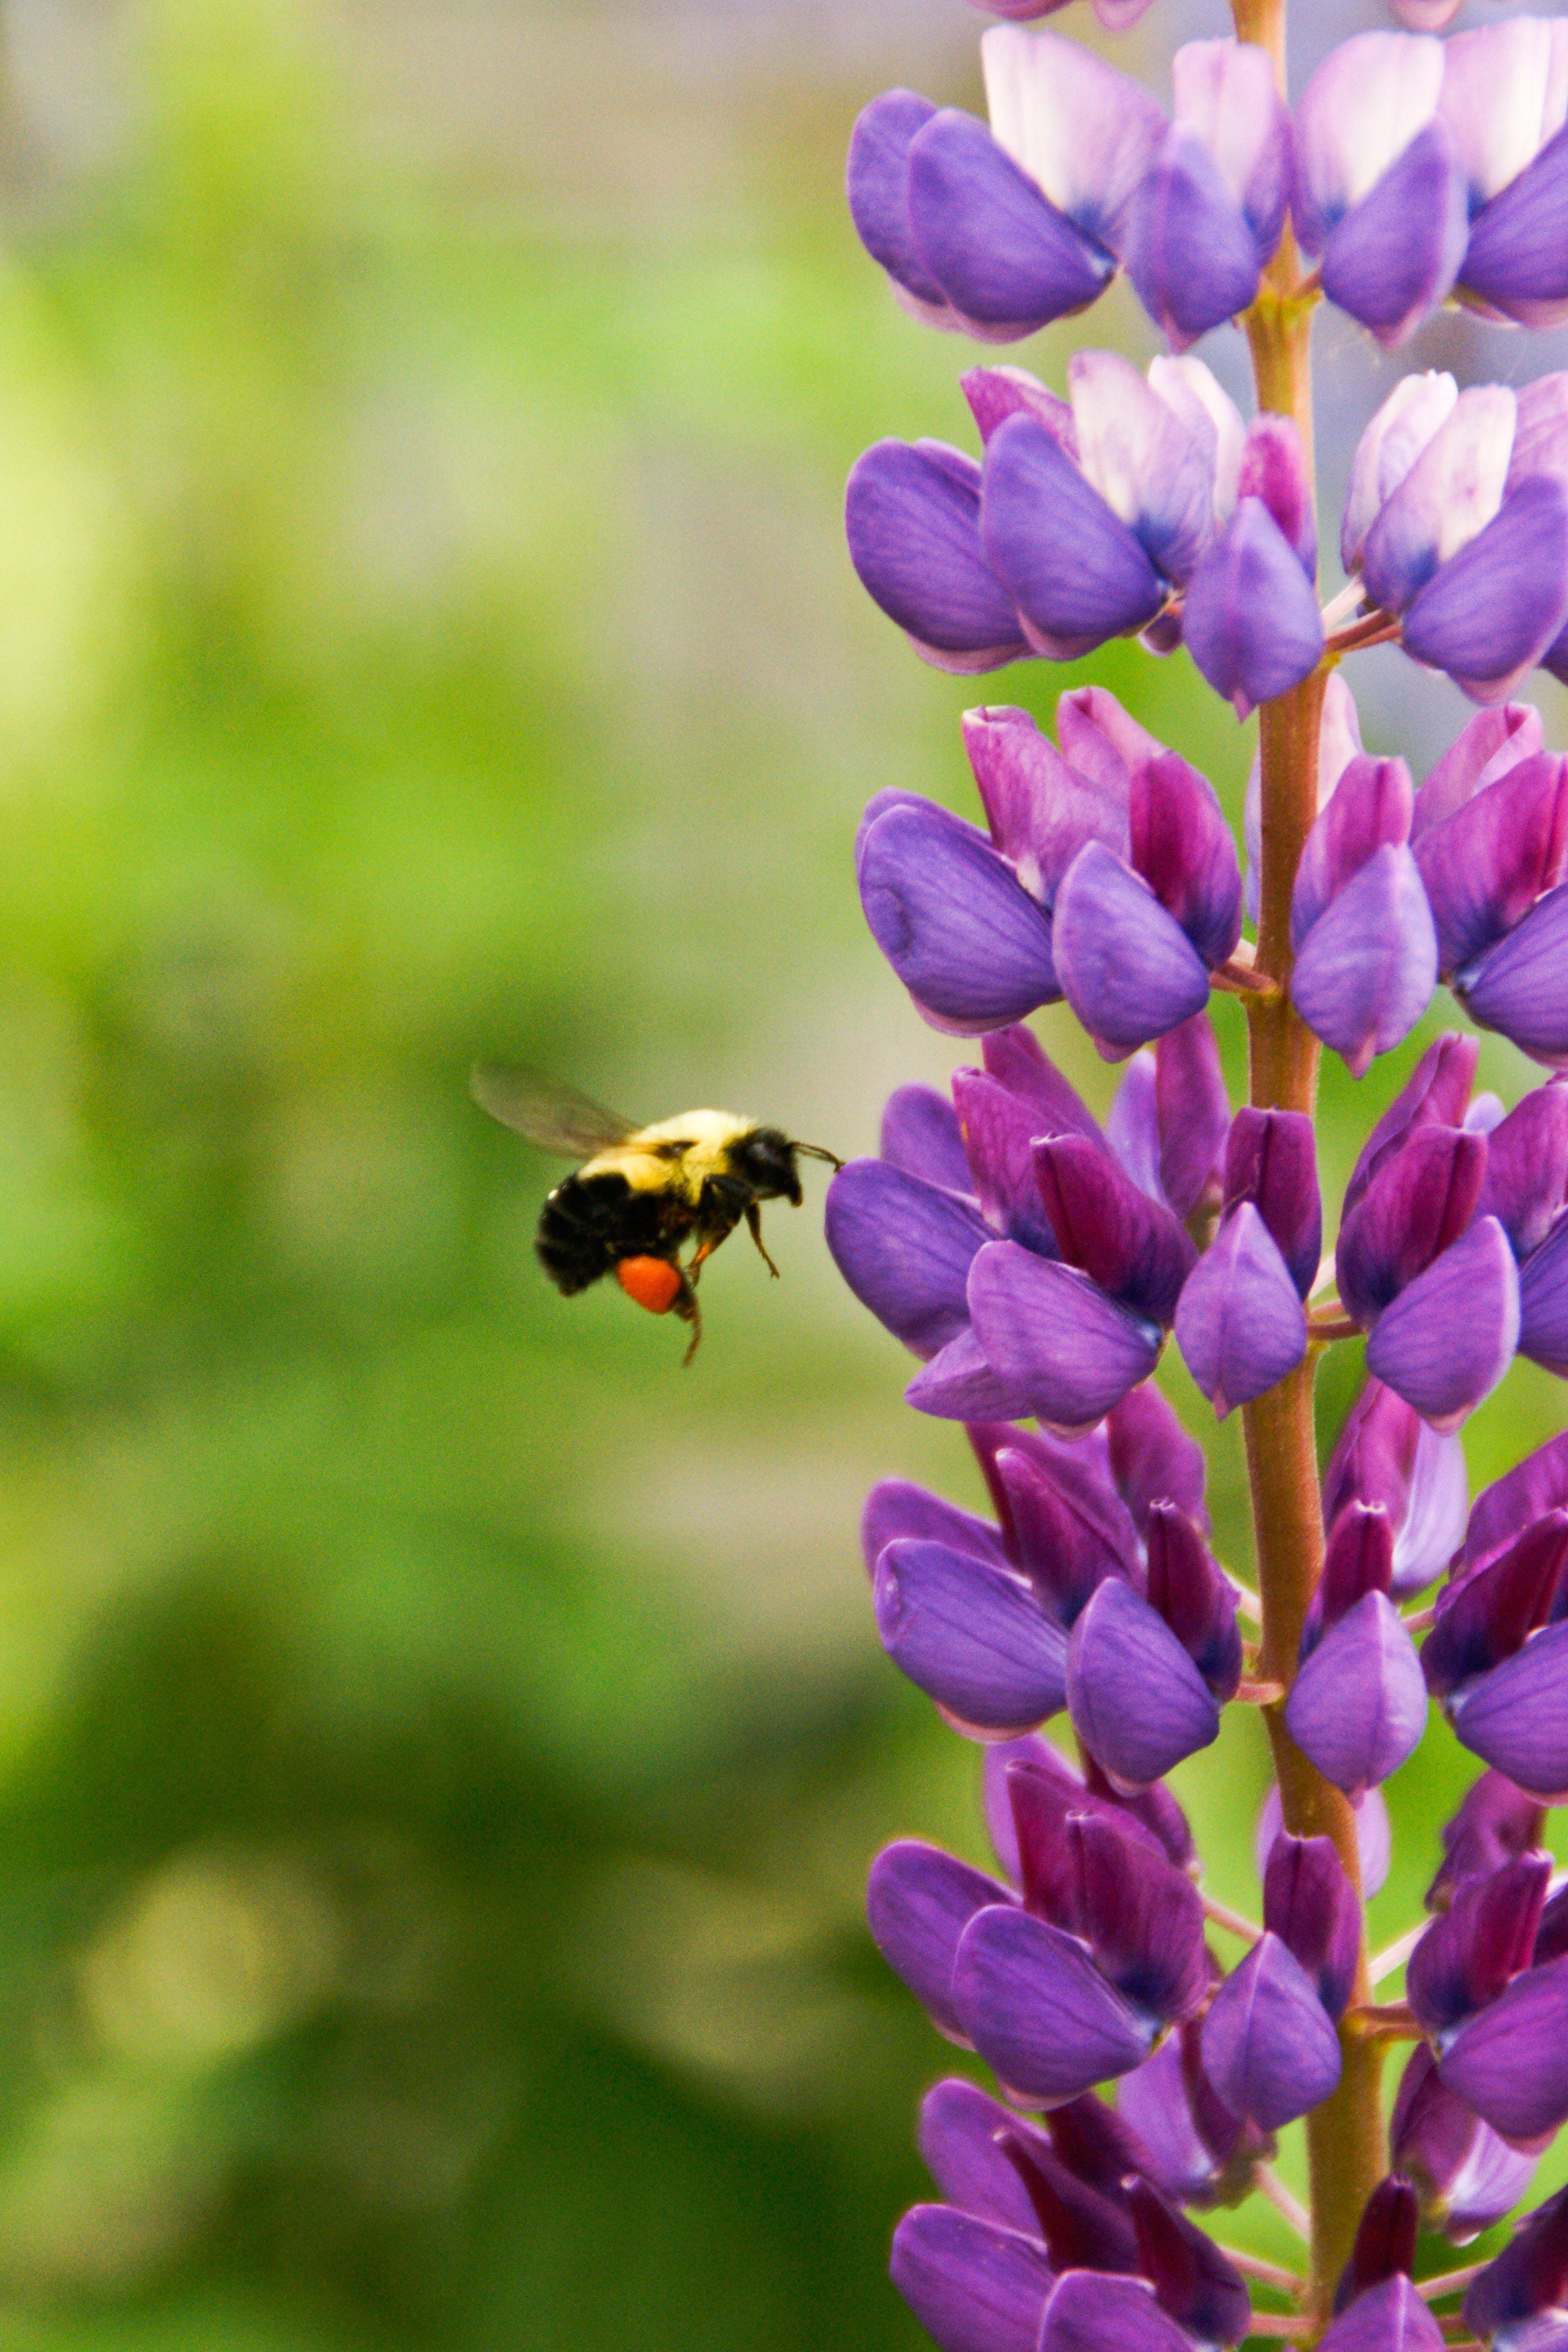 157358 bee%20on%20flower 932b4d original 1424810315